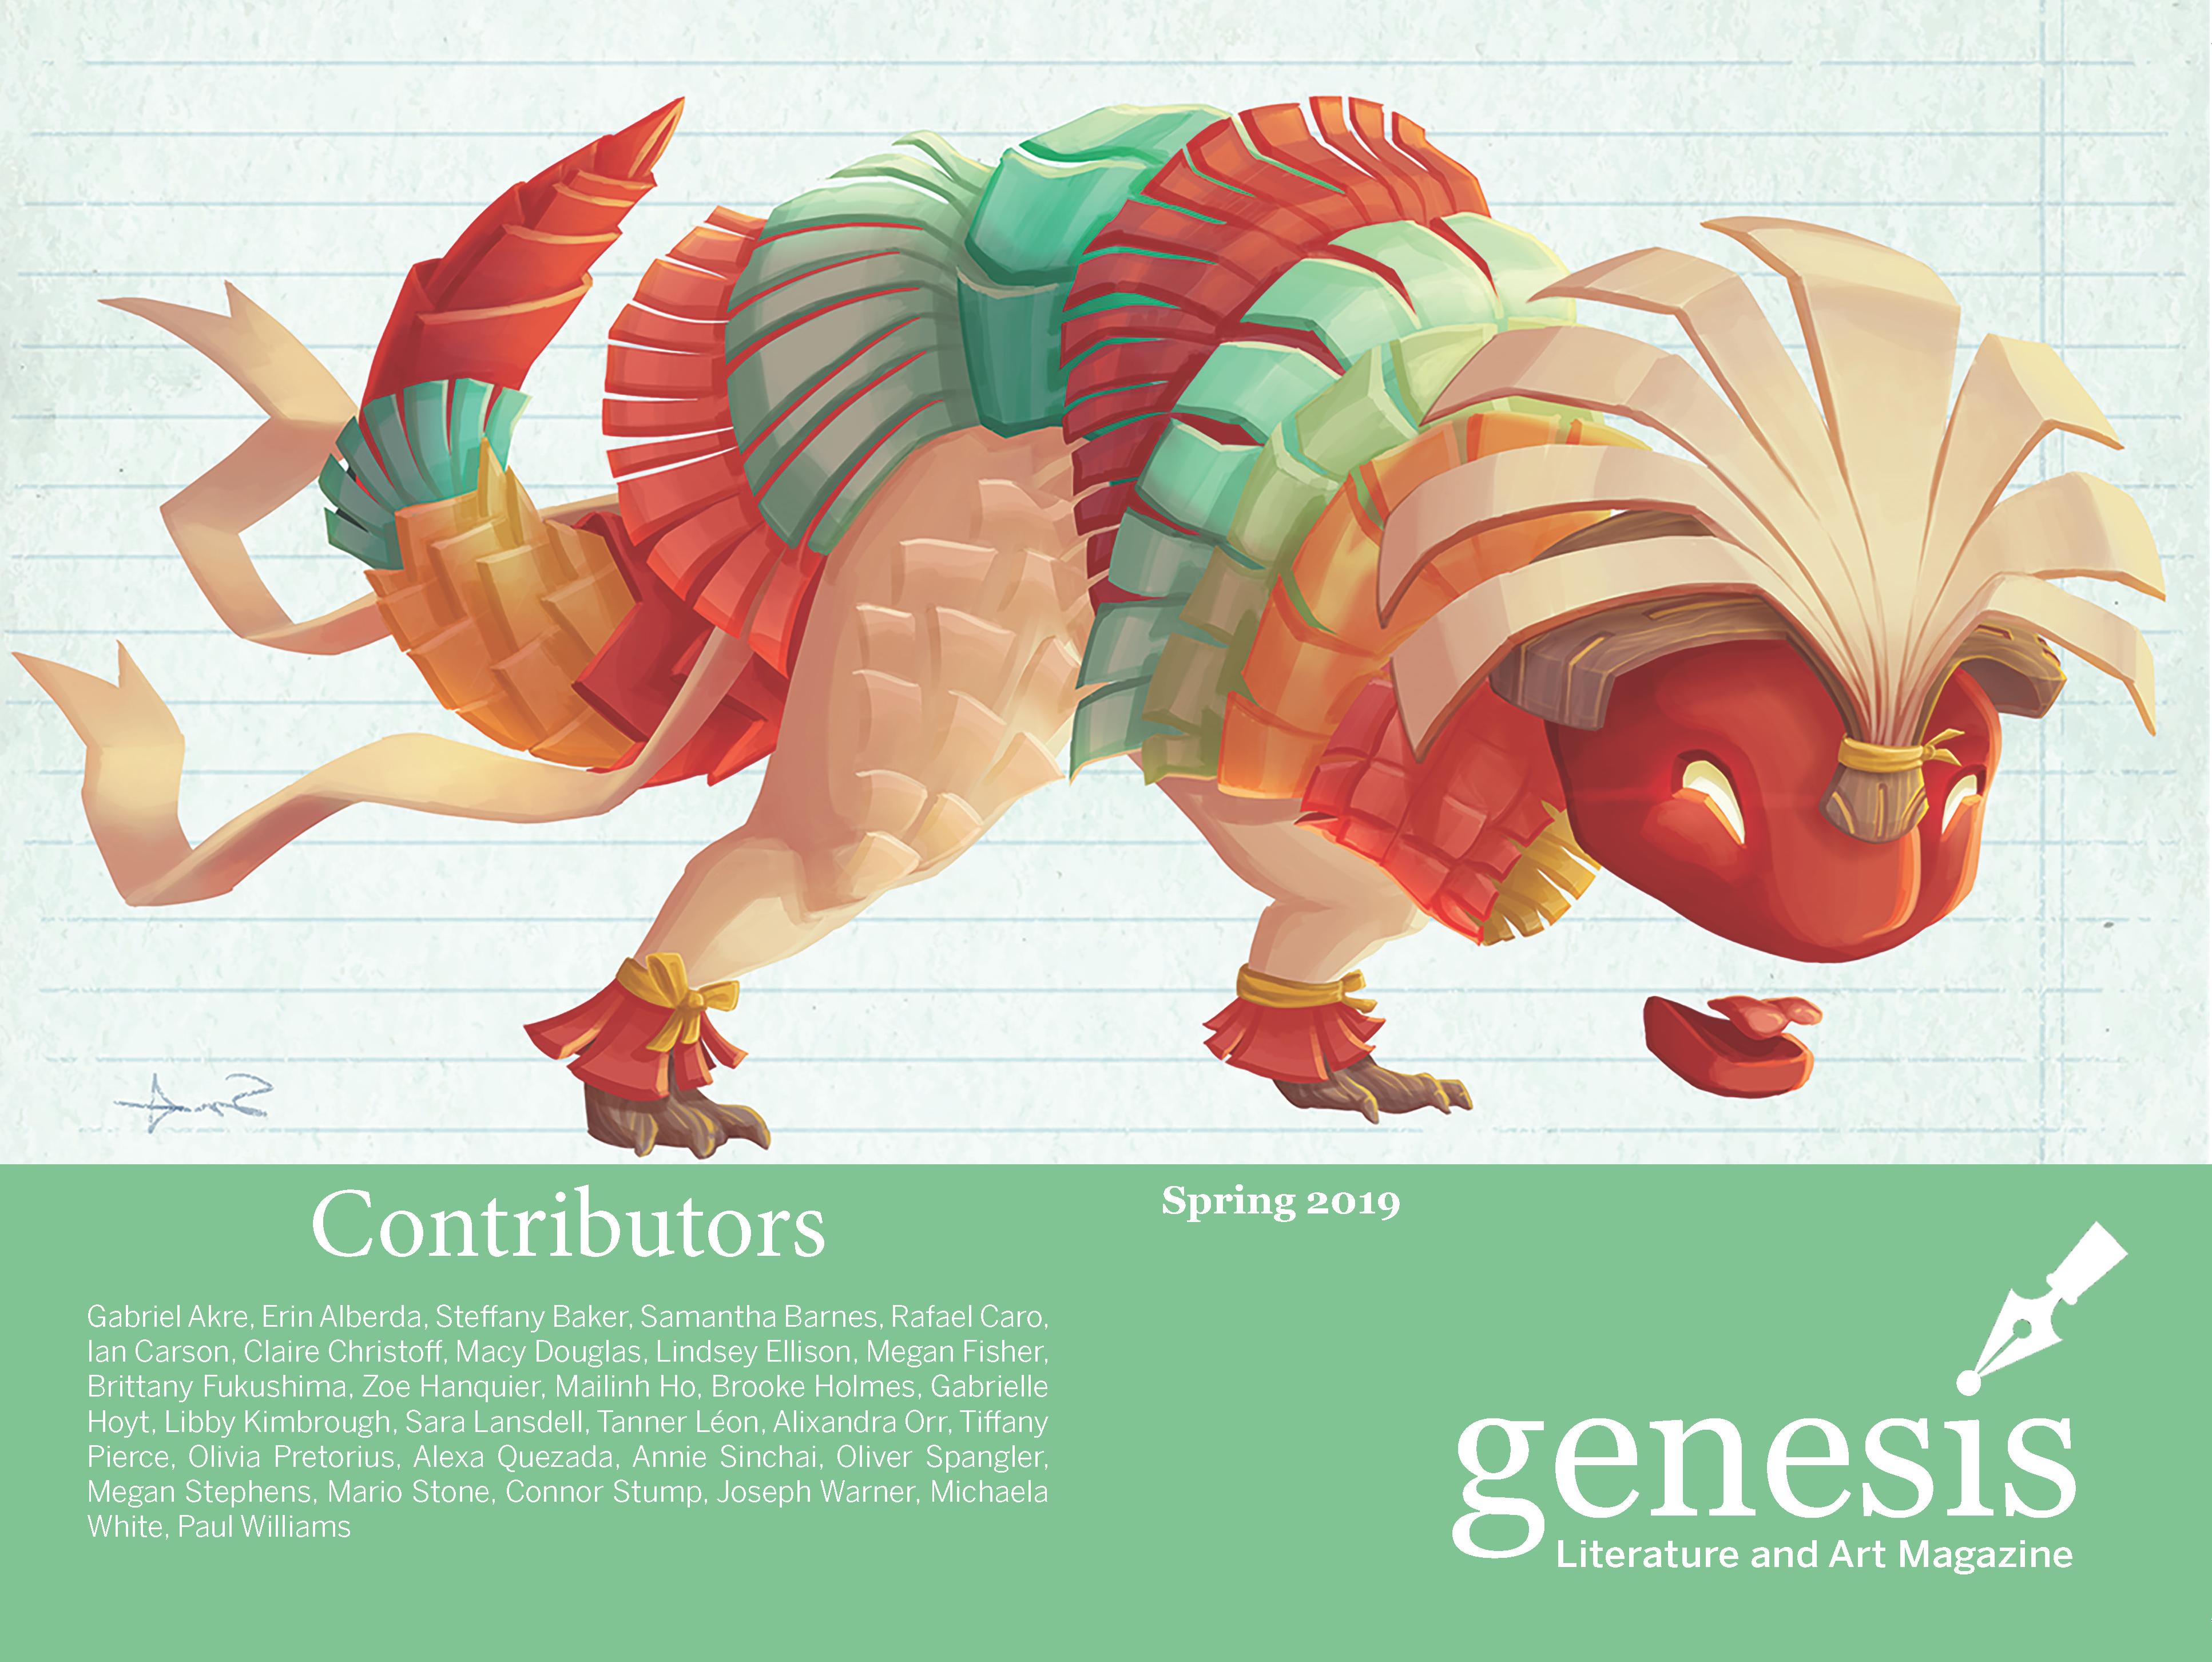 genesis Spring 2019 cover